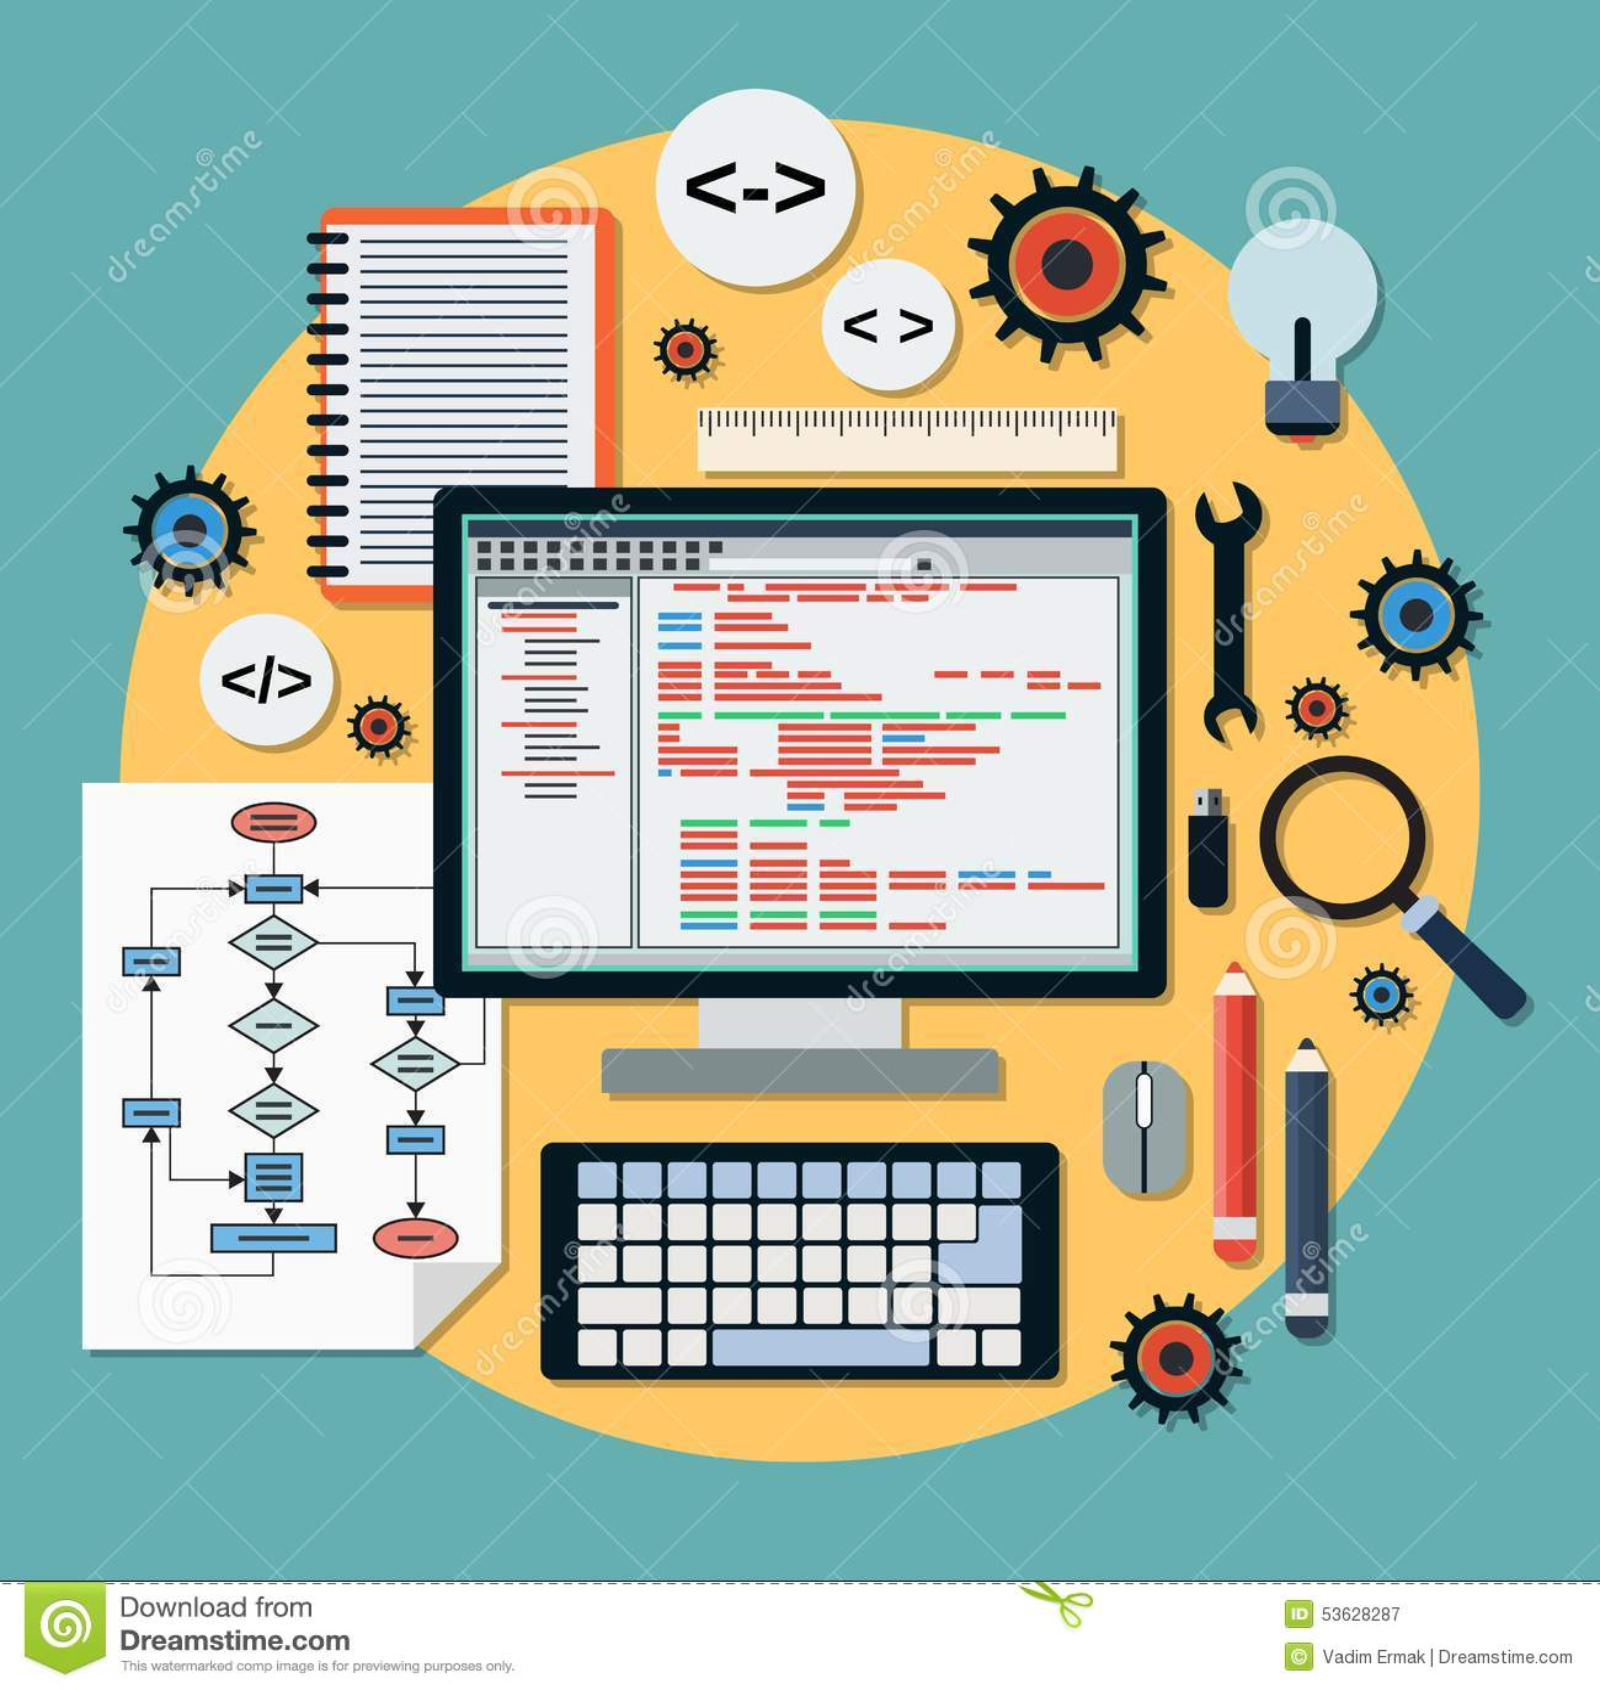 Program Coding Vector Concept Stock Vector Image 53628287